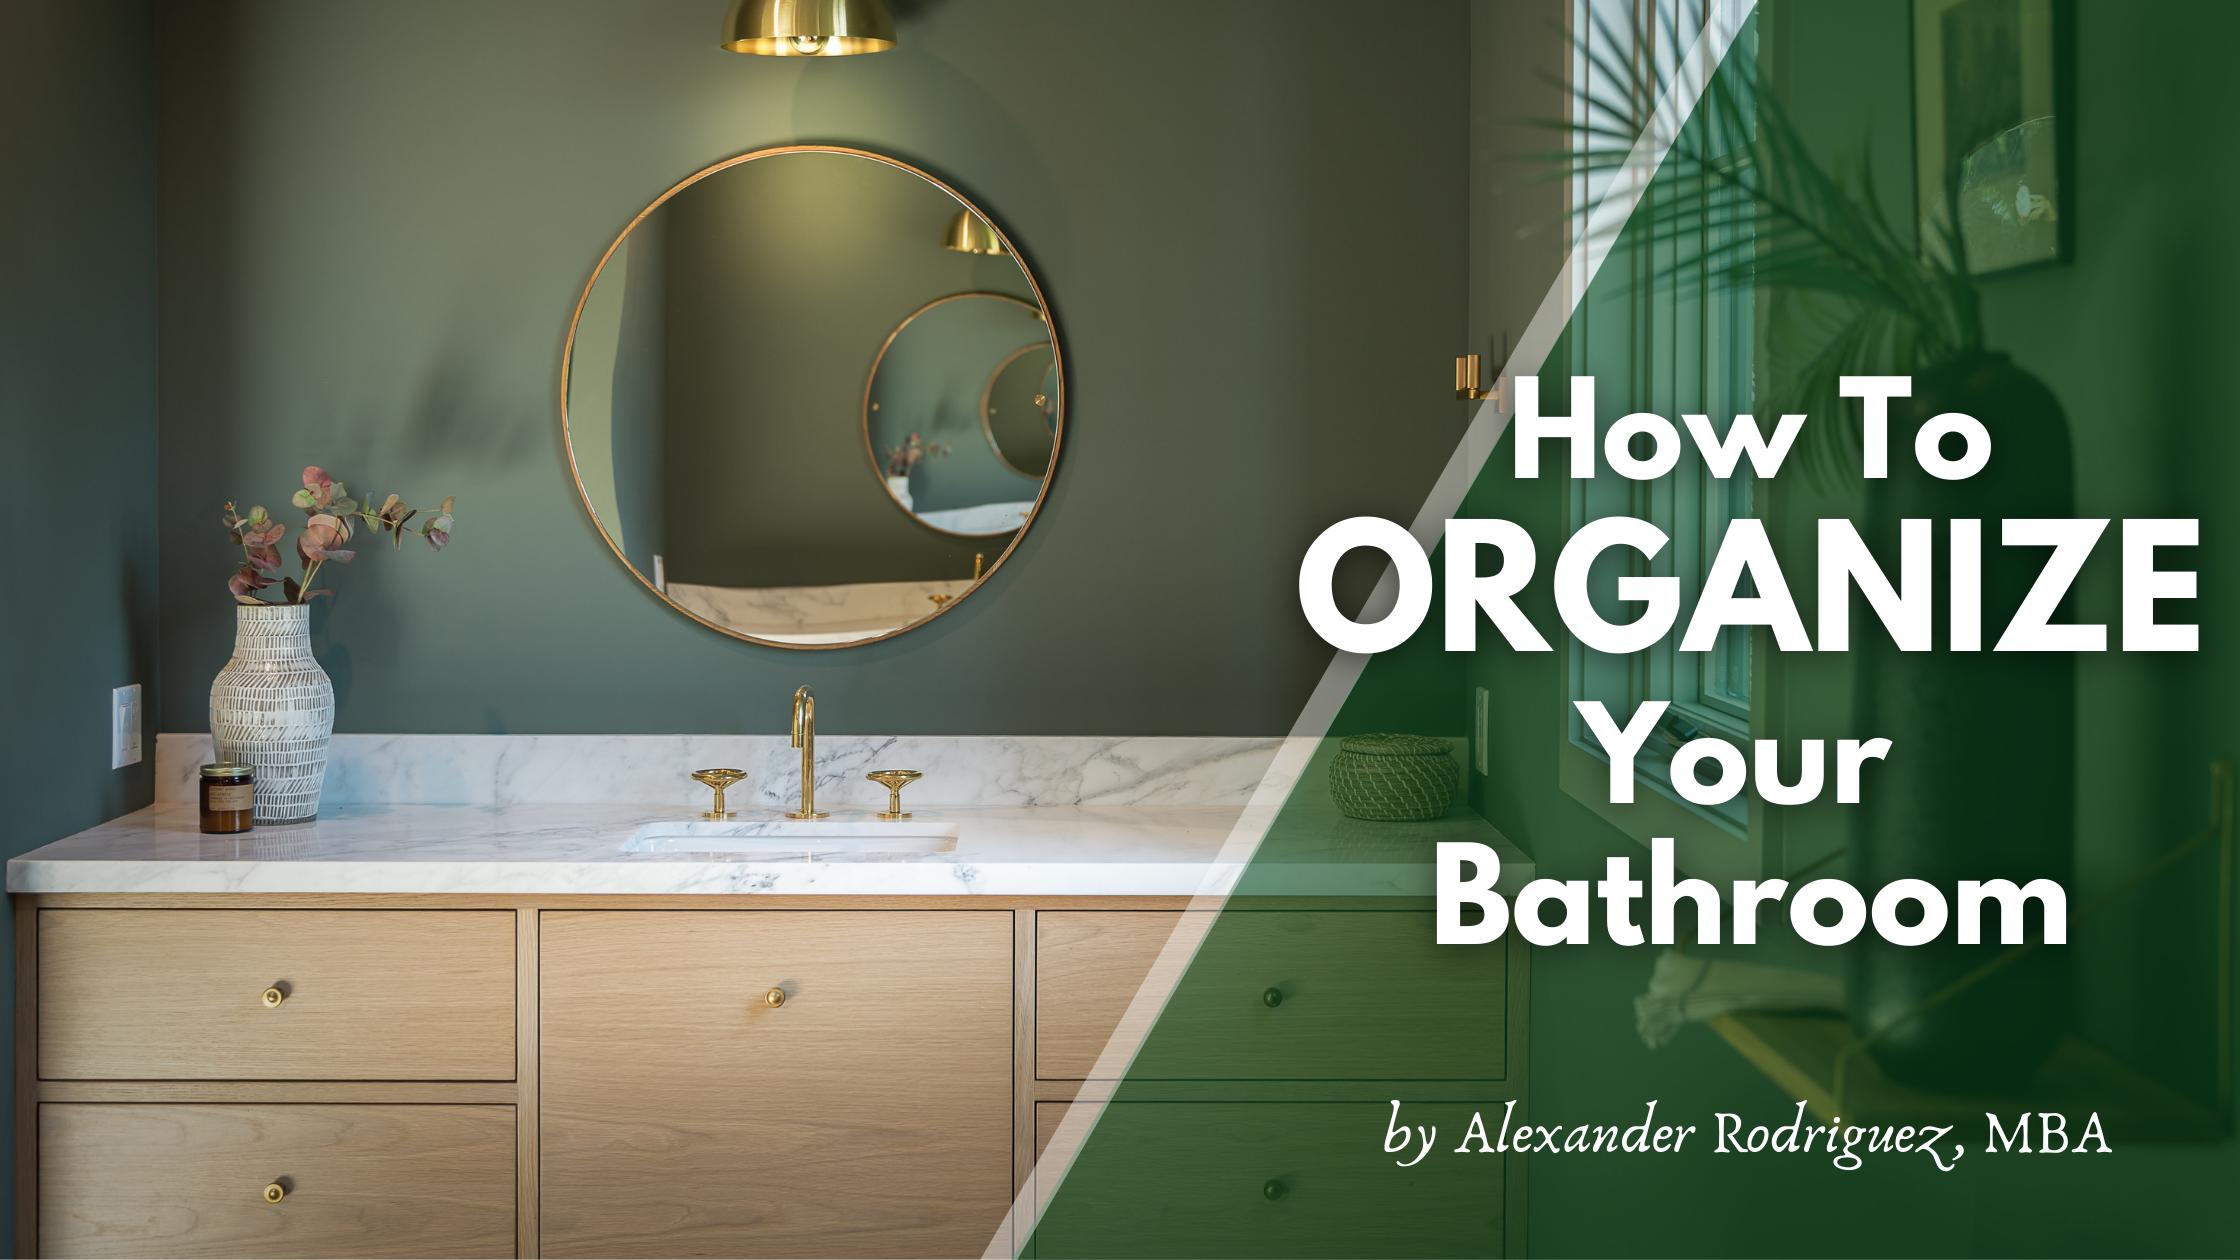 How to Keep Your Bathroom Organized